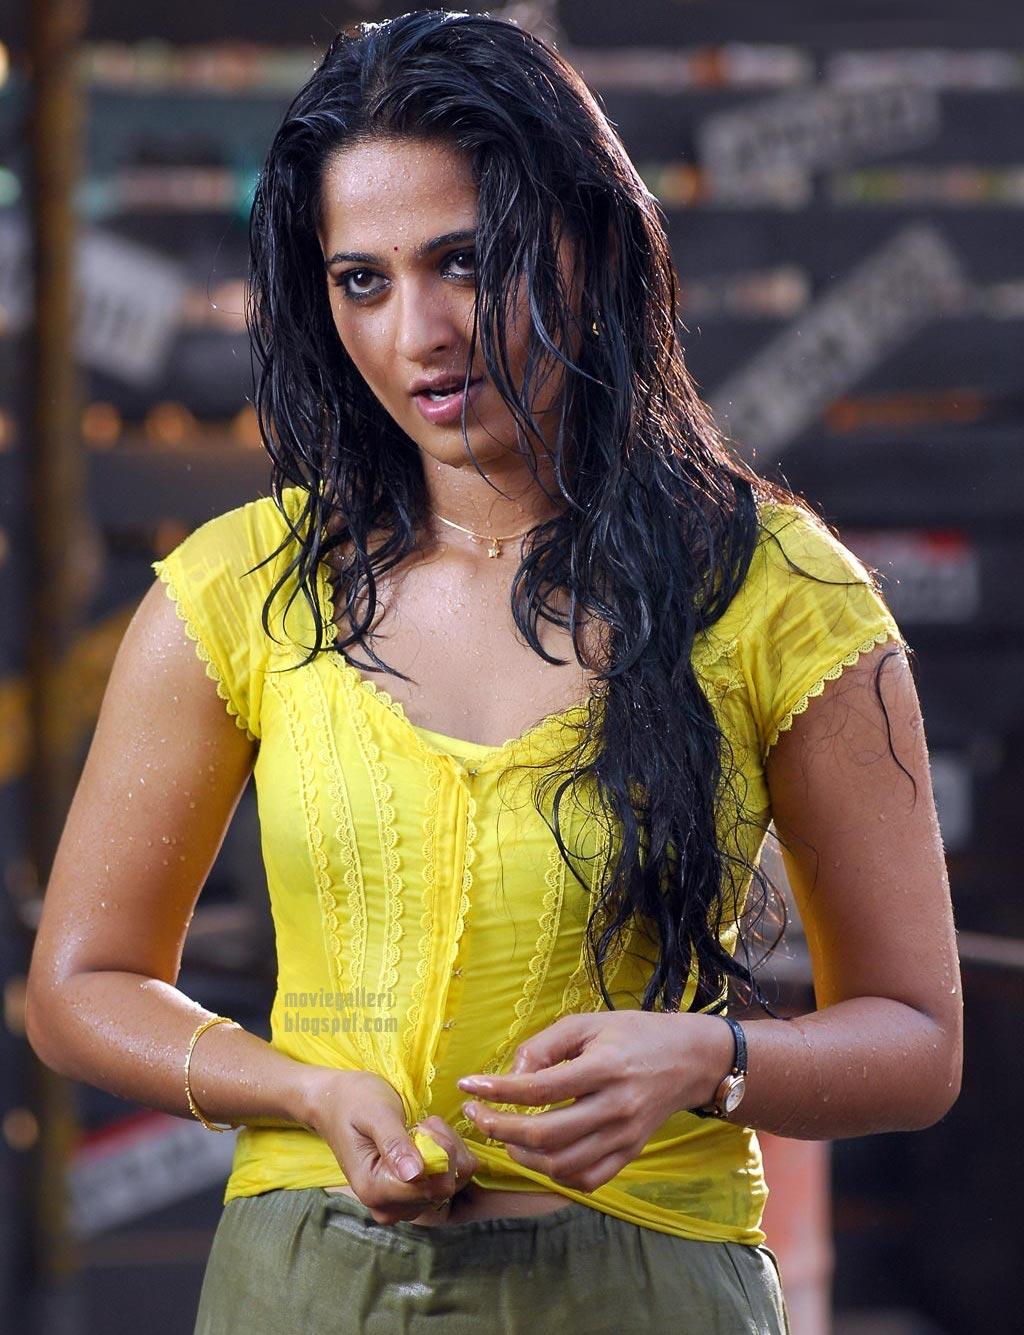 Tamil Movies Watch Online | Video di Porno Gratis: Film Sesso XXX ...